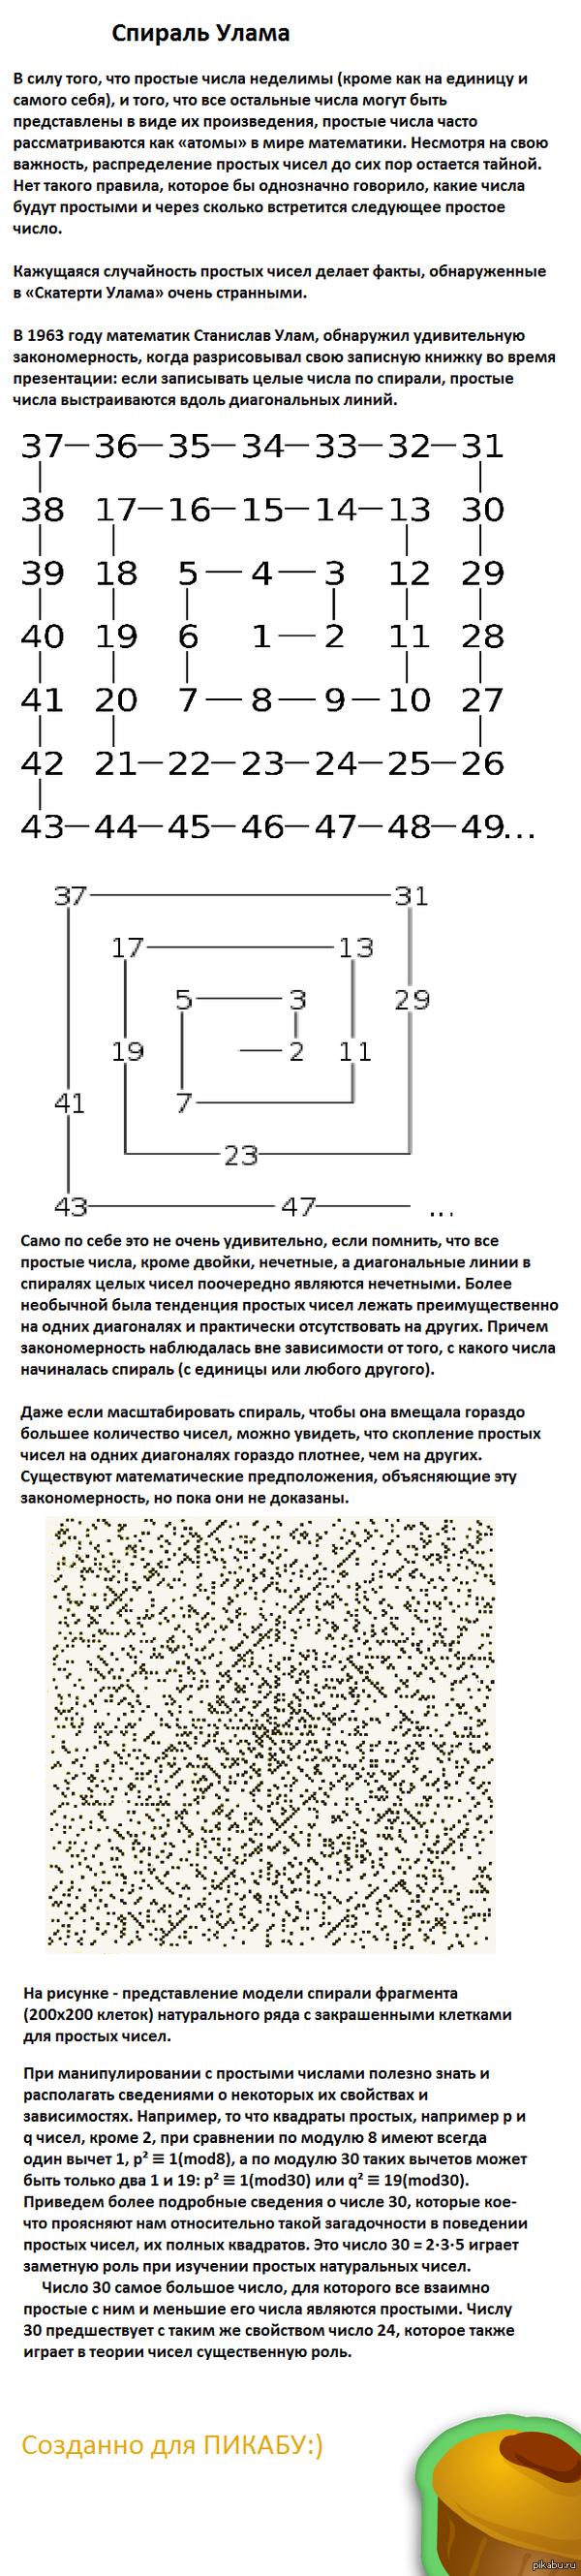 "Спираль Улама по другому ""скатерть"" Улама"